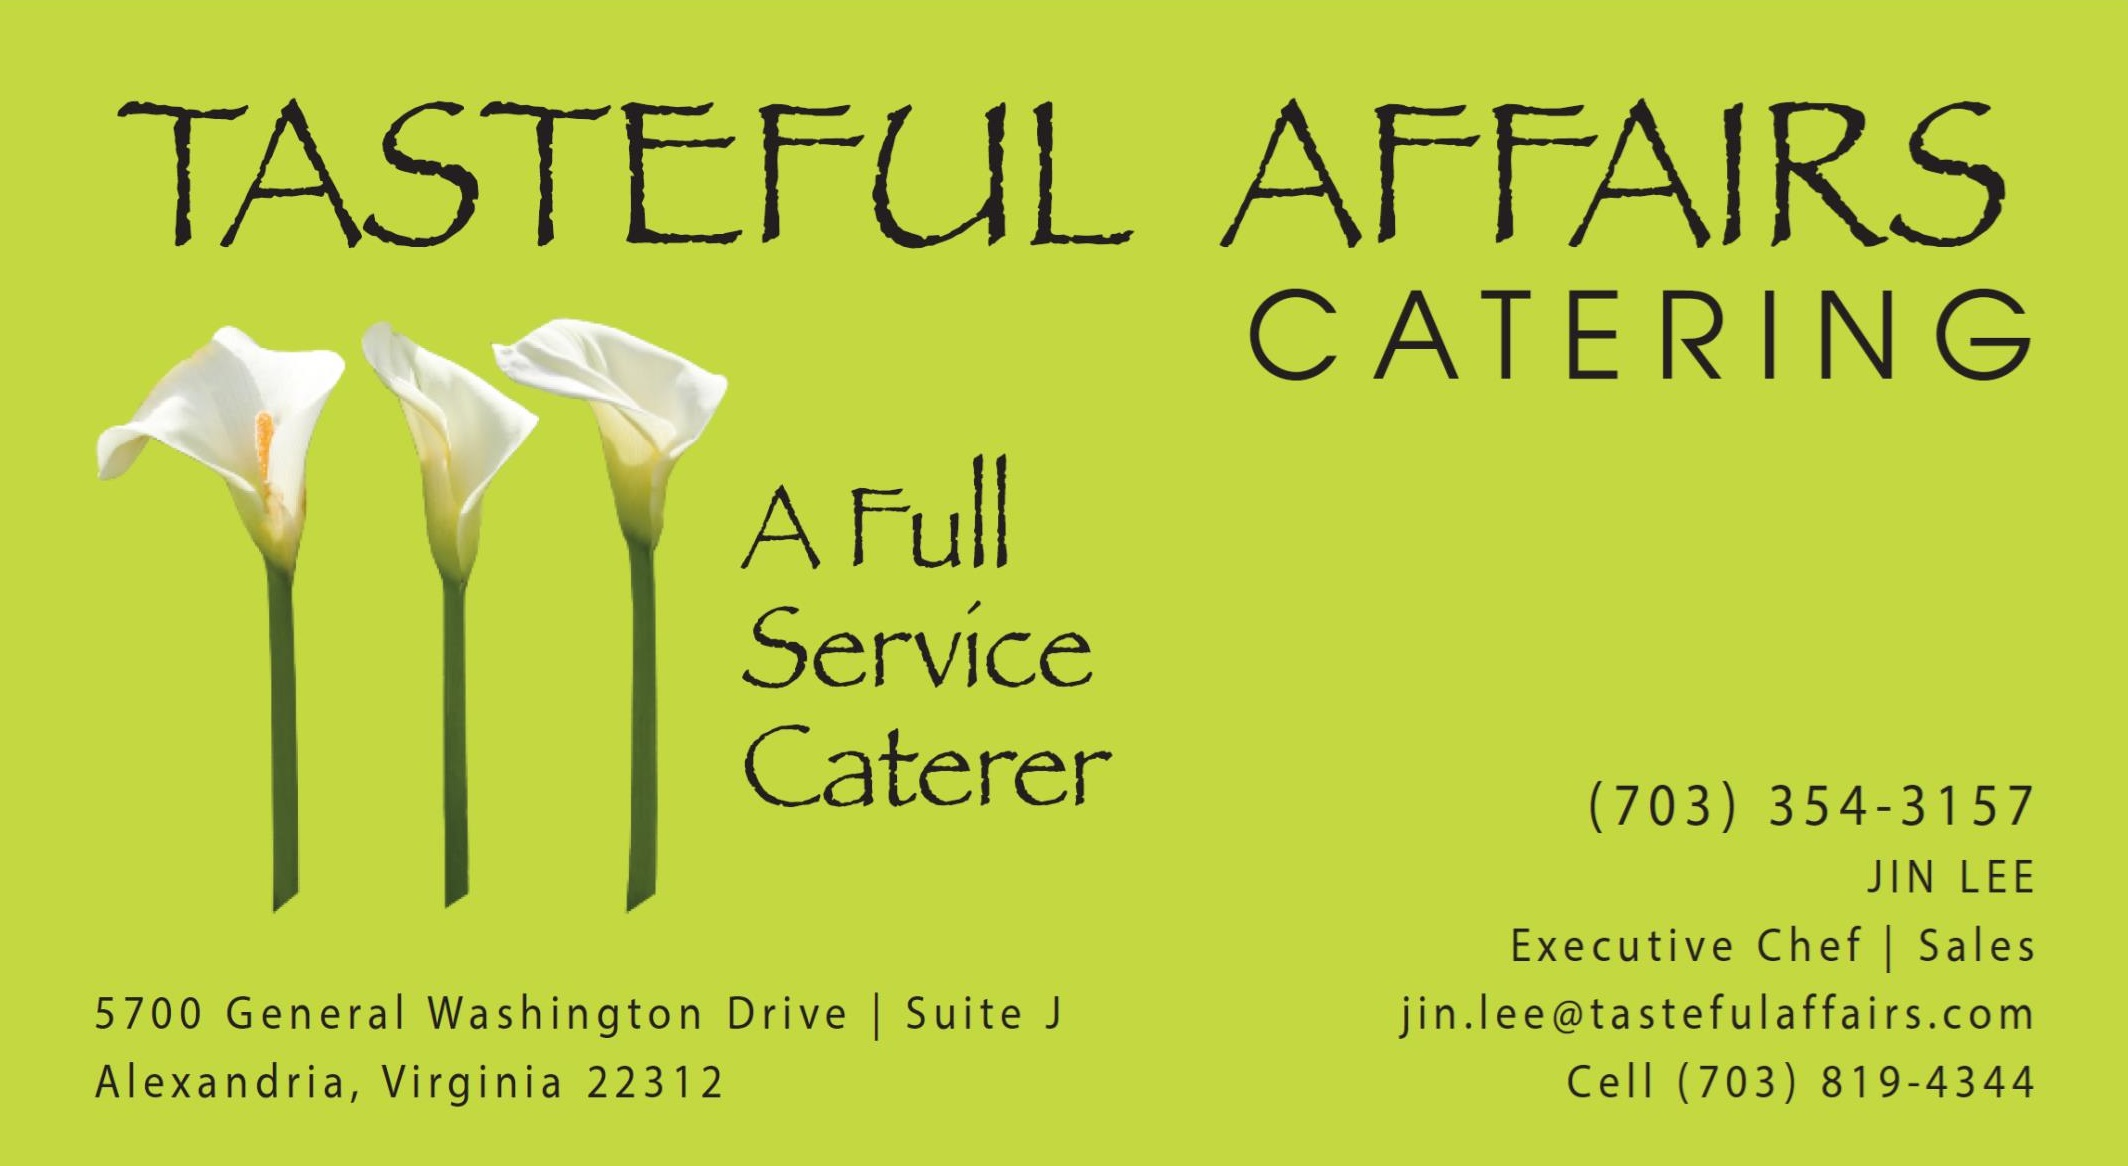 Tasteful Affairs at Wedding Blueprint: A wedding open house with DC's top wedding professionals. Feb 22 in Alexandria, VA